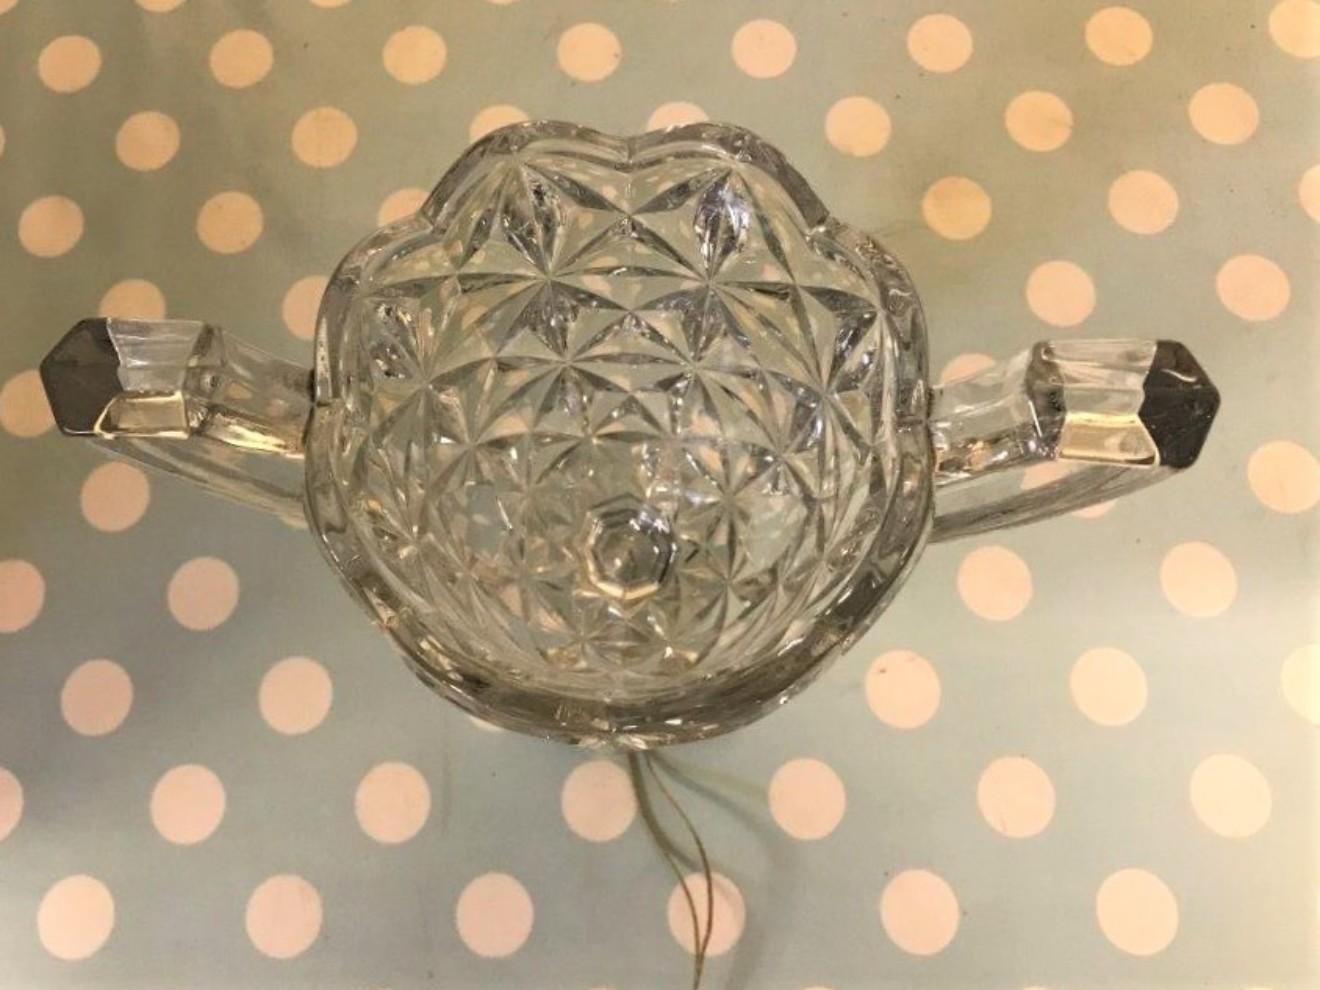 Double Handled Celery Glass Vase